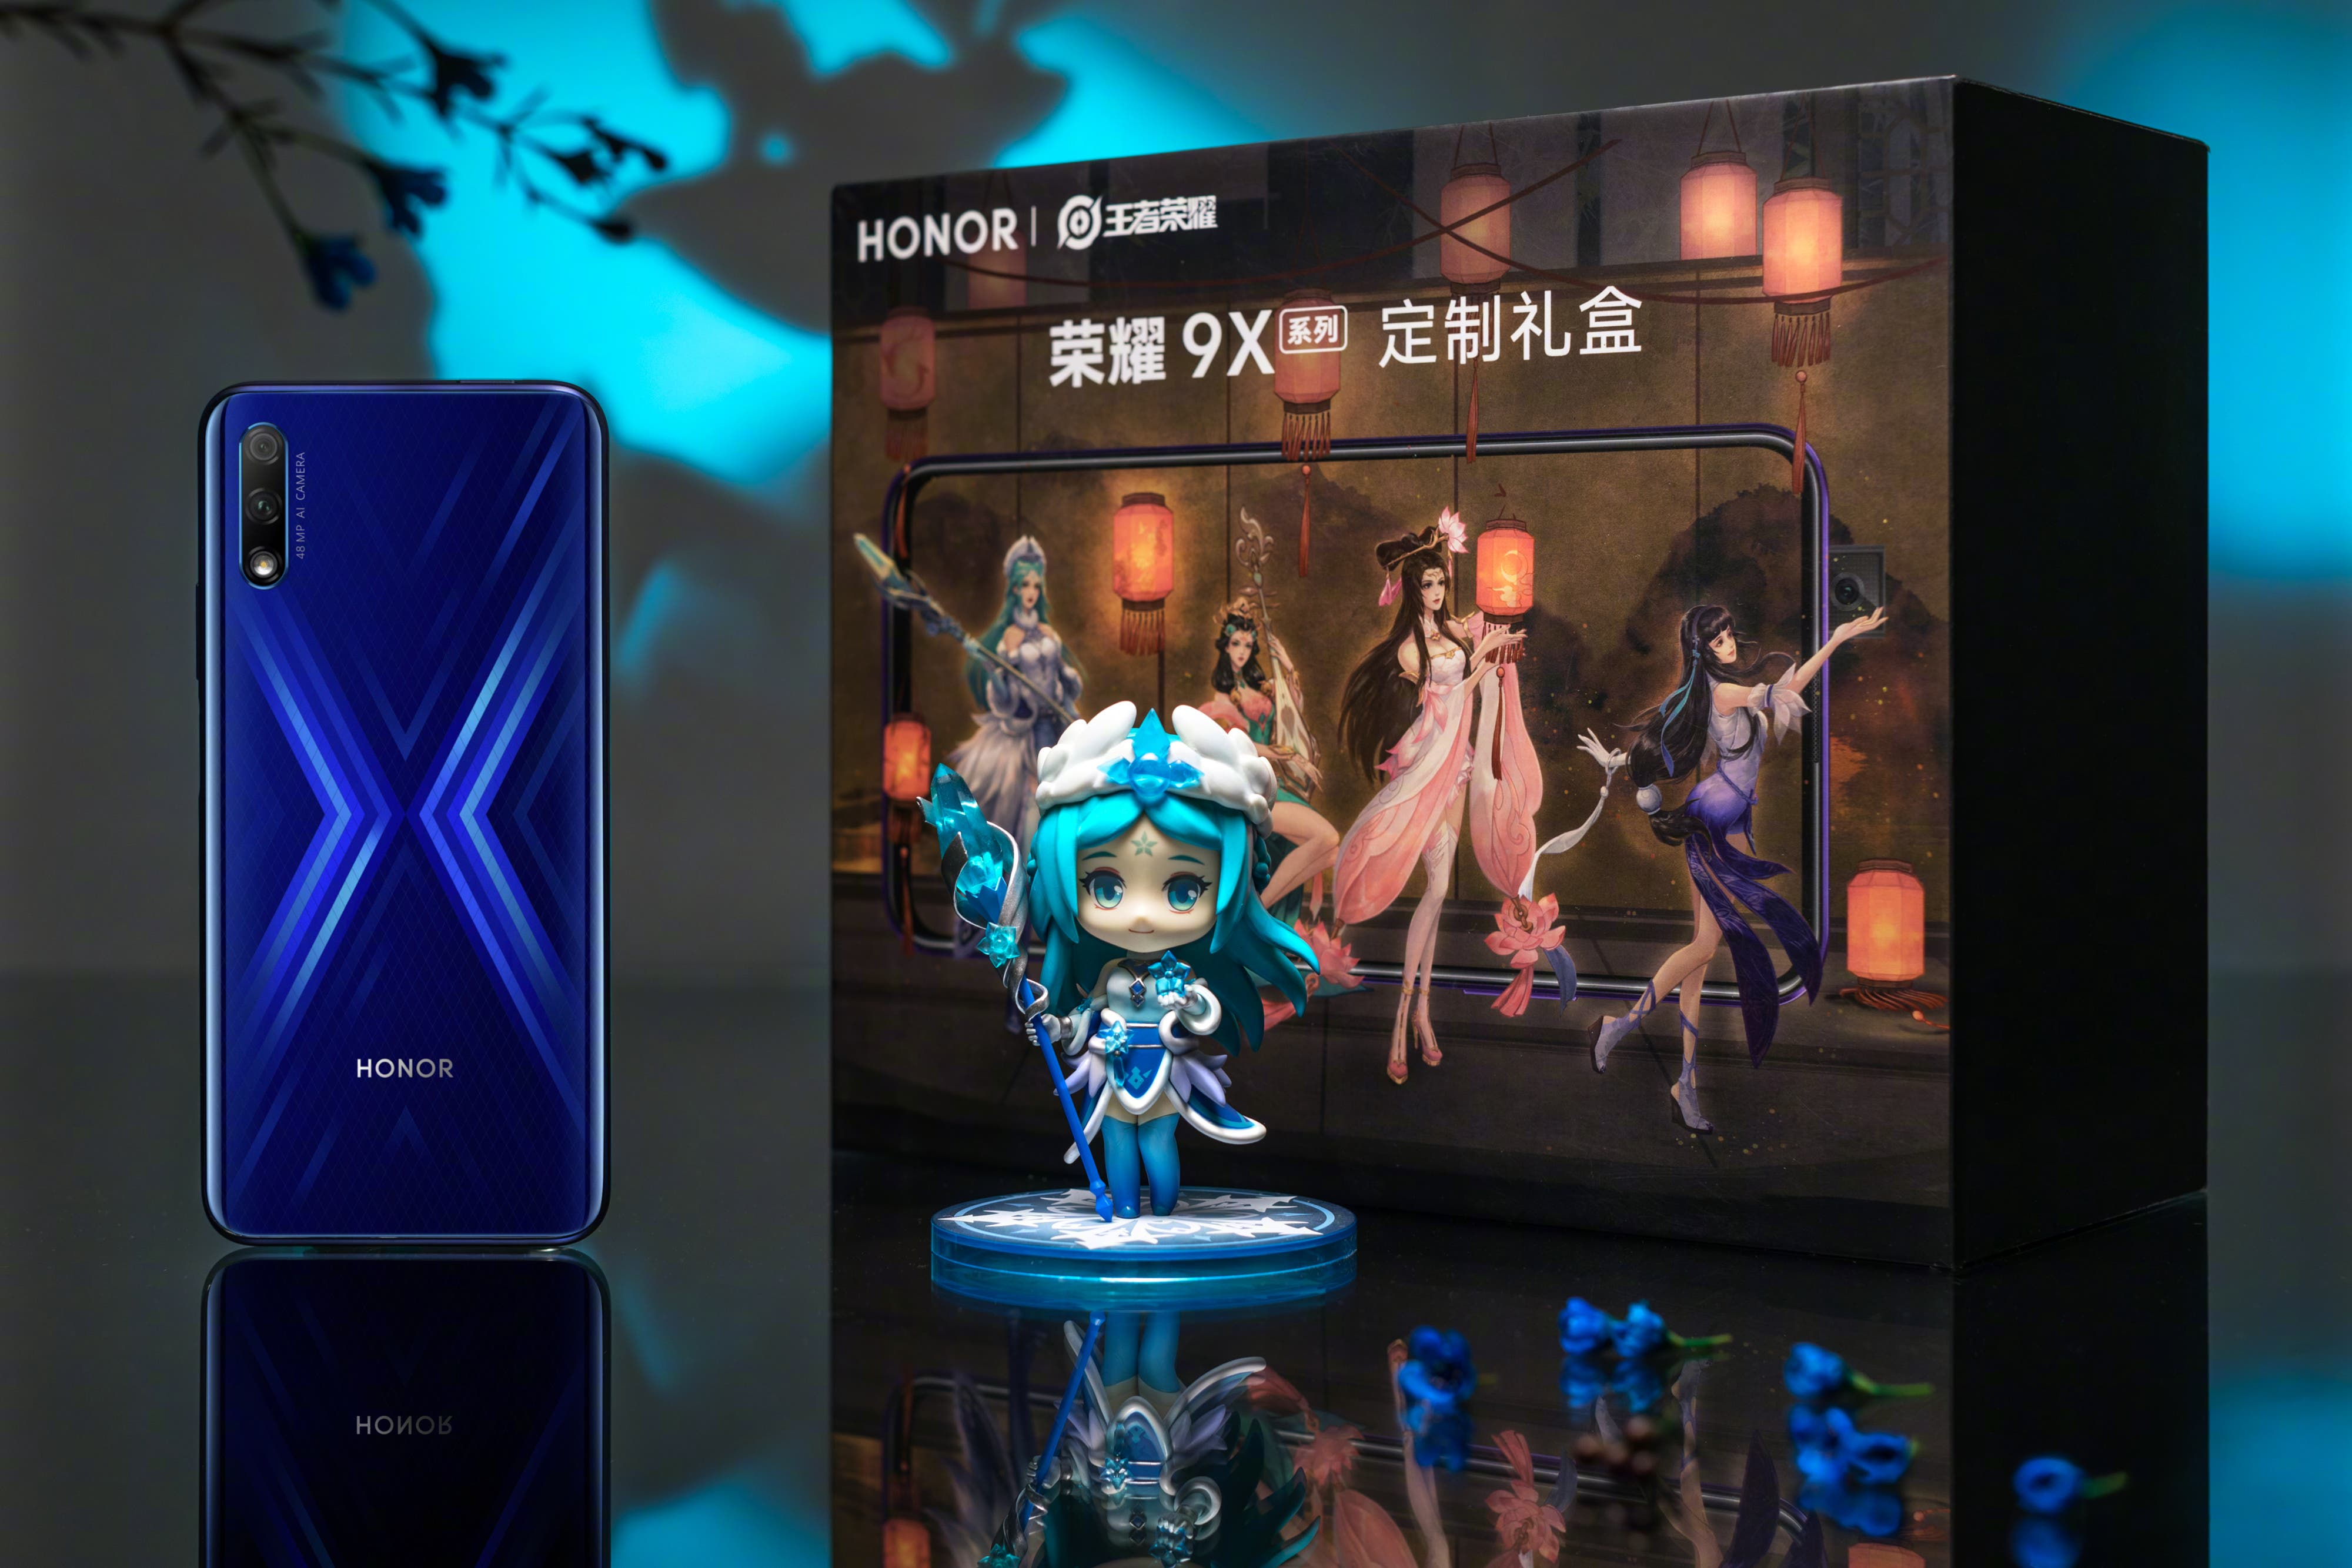 Honor 9X Honor of Kings Custom Gift Box Edition